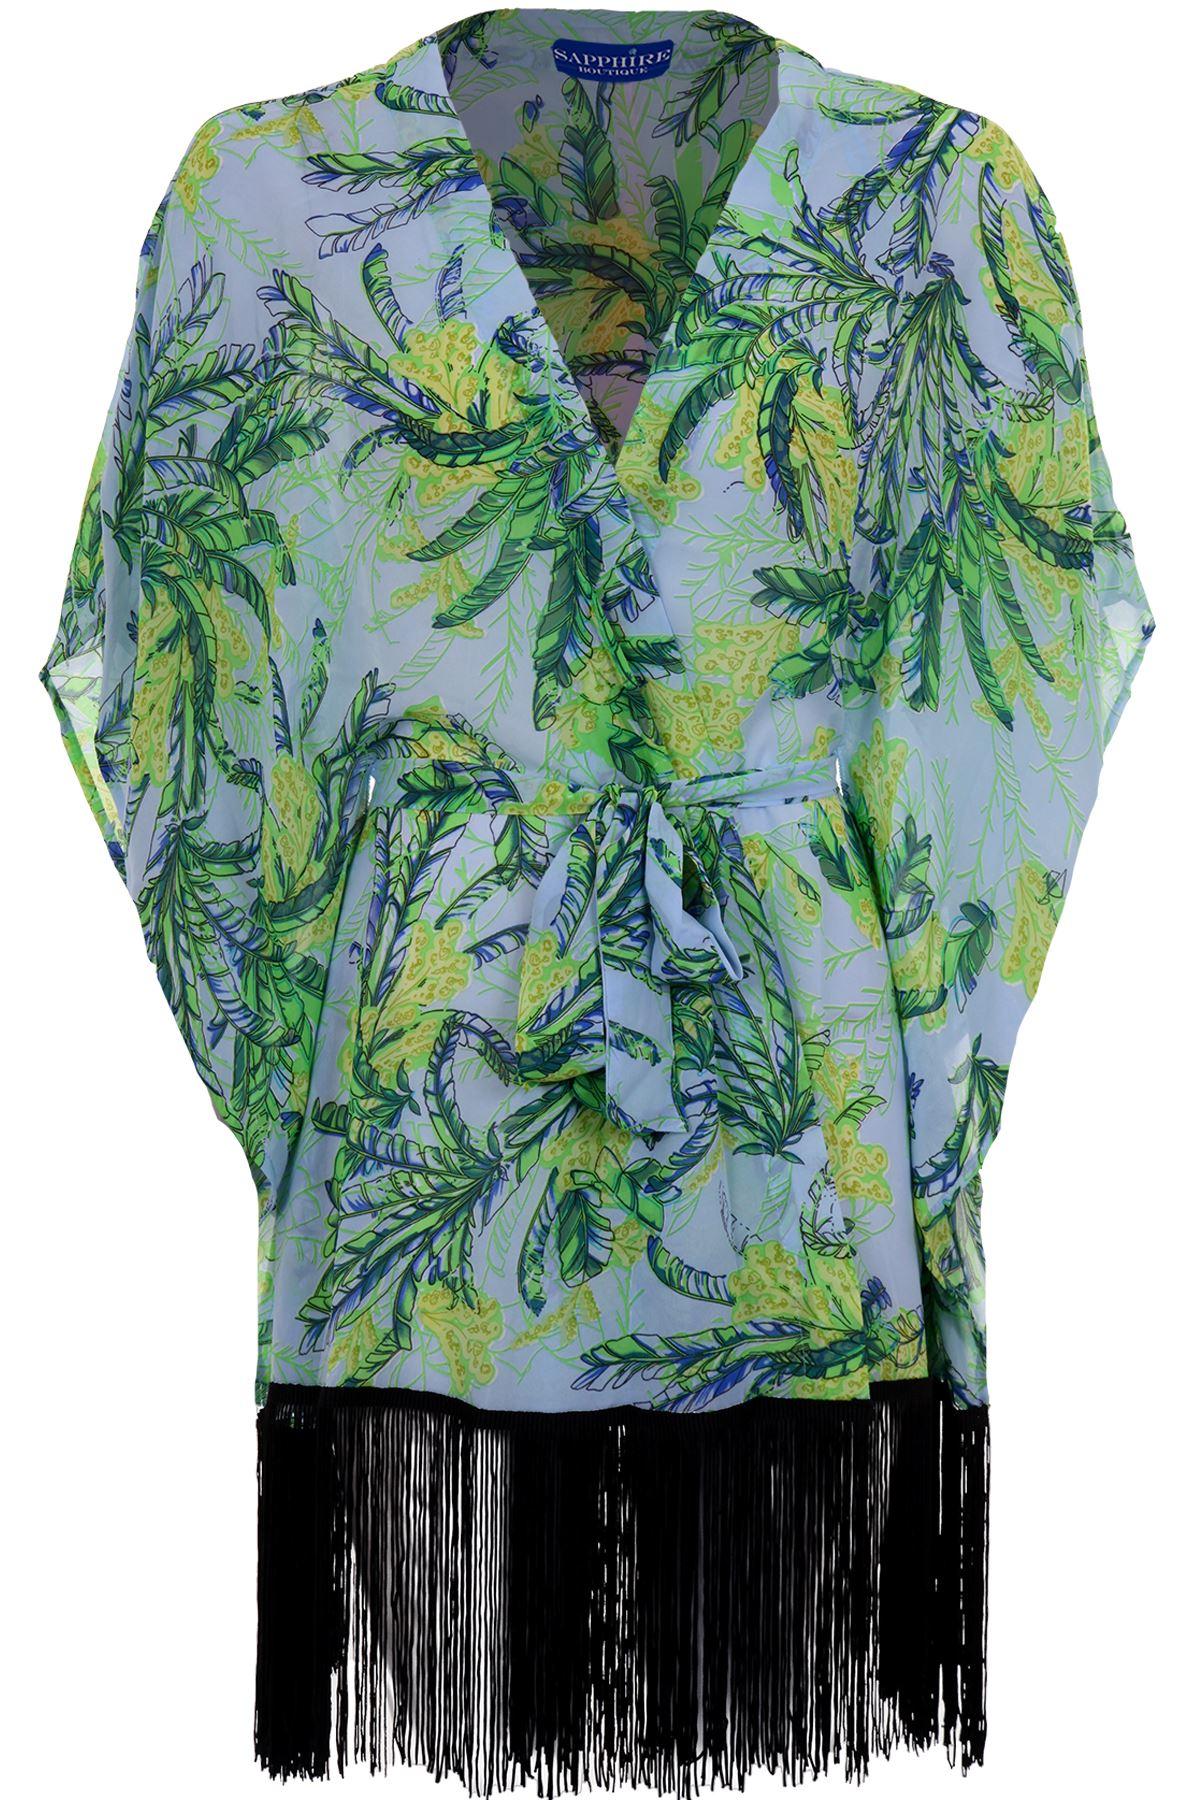 Damen fledermaus rmel kurz rmlig blumen chiffon damen mit - Kimono jacke damen ...